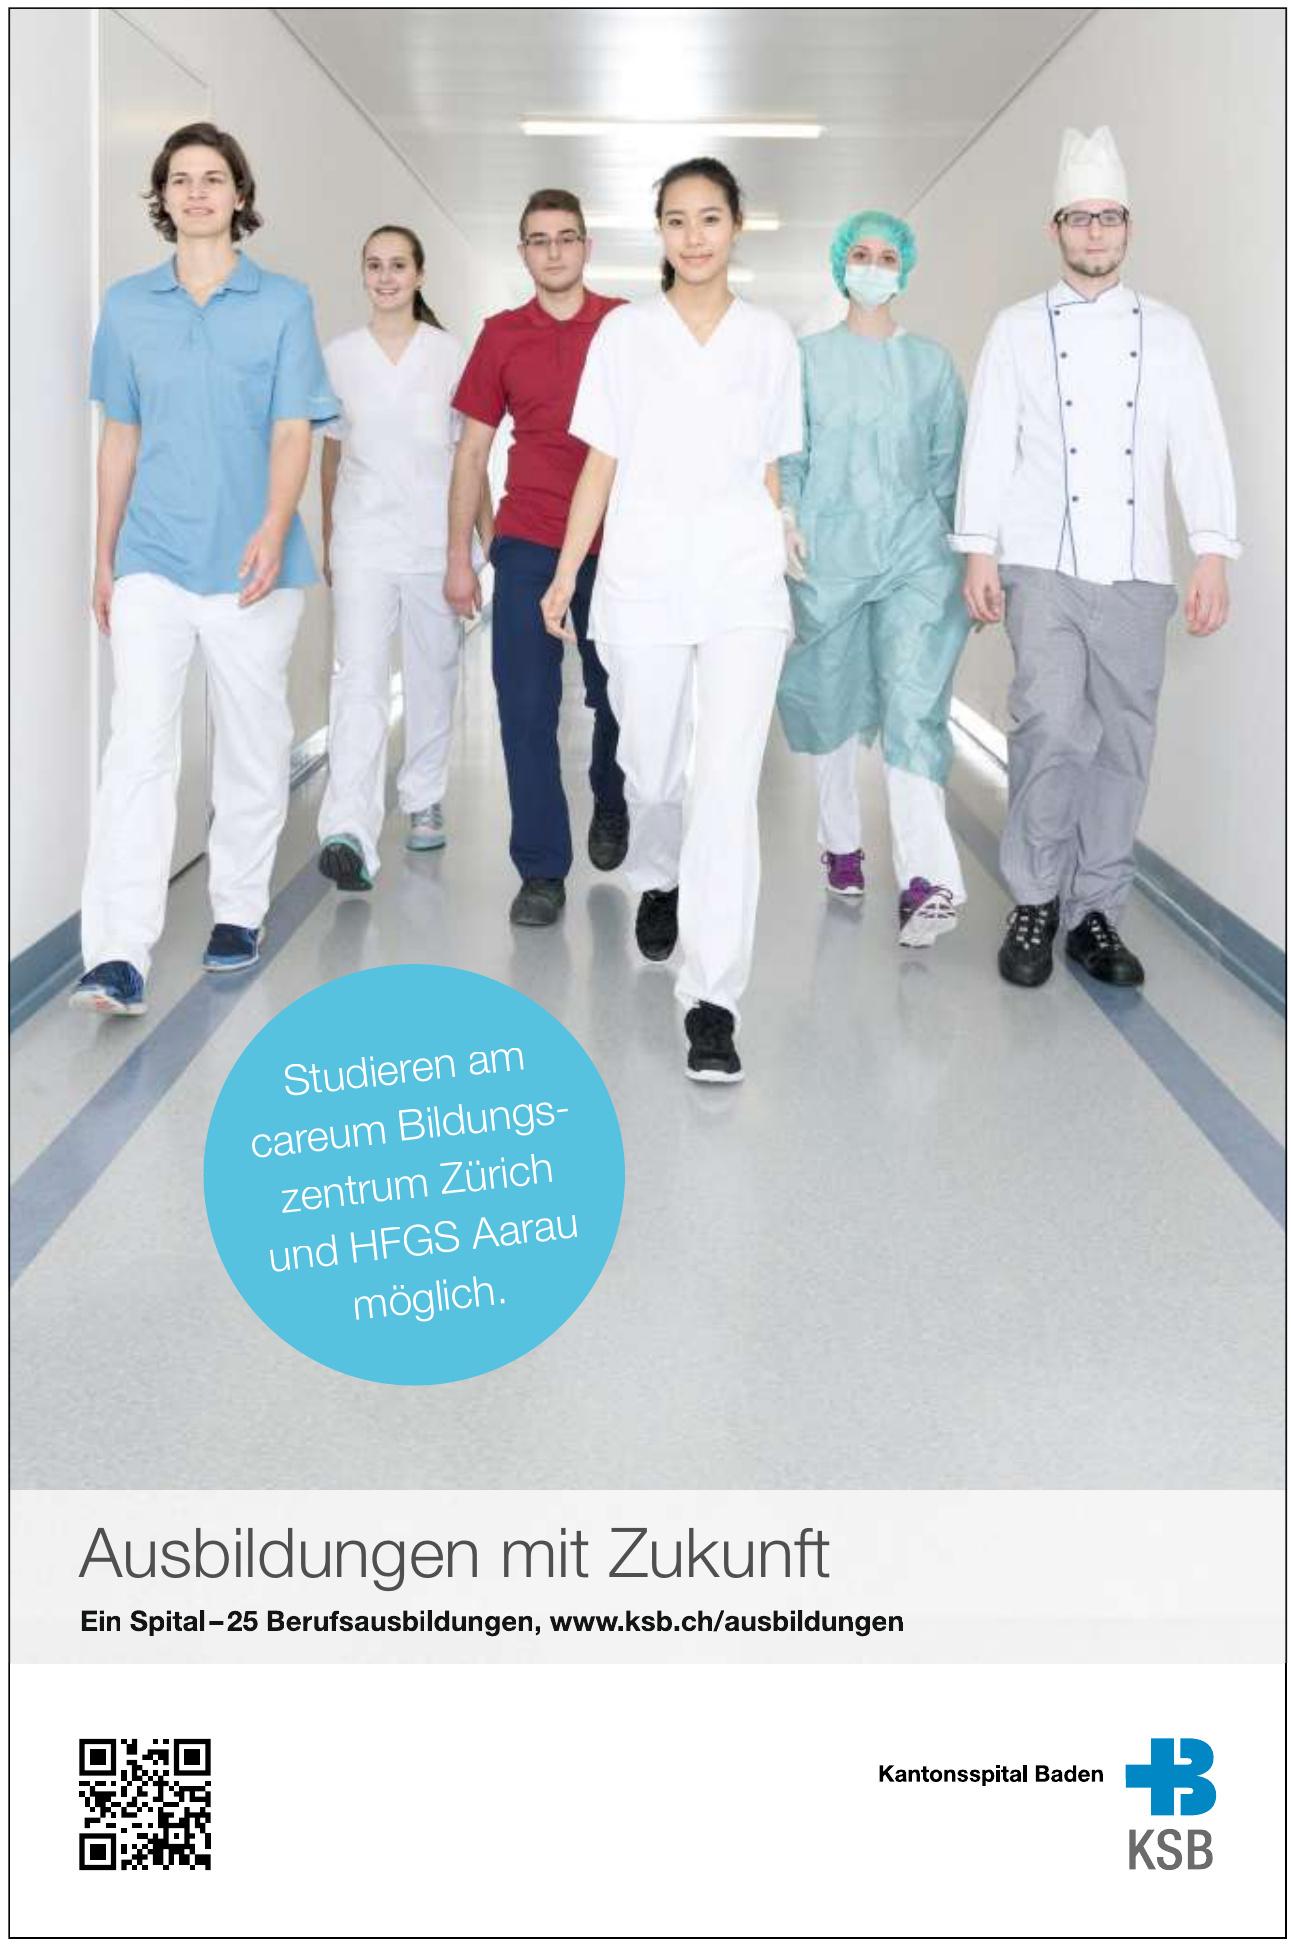 Kantonspital Baden